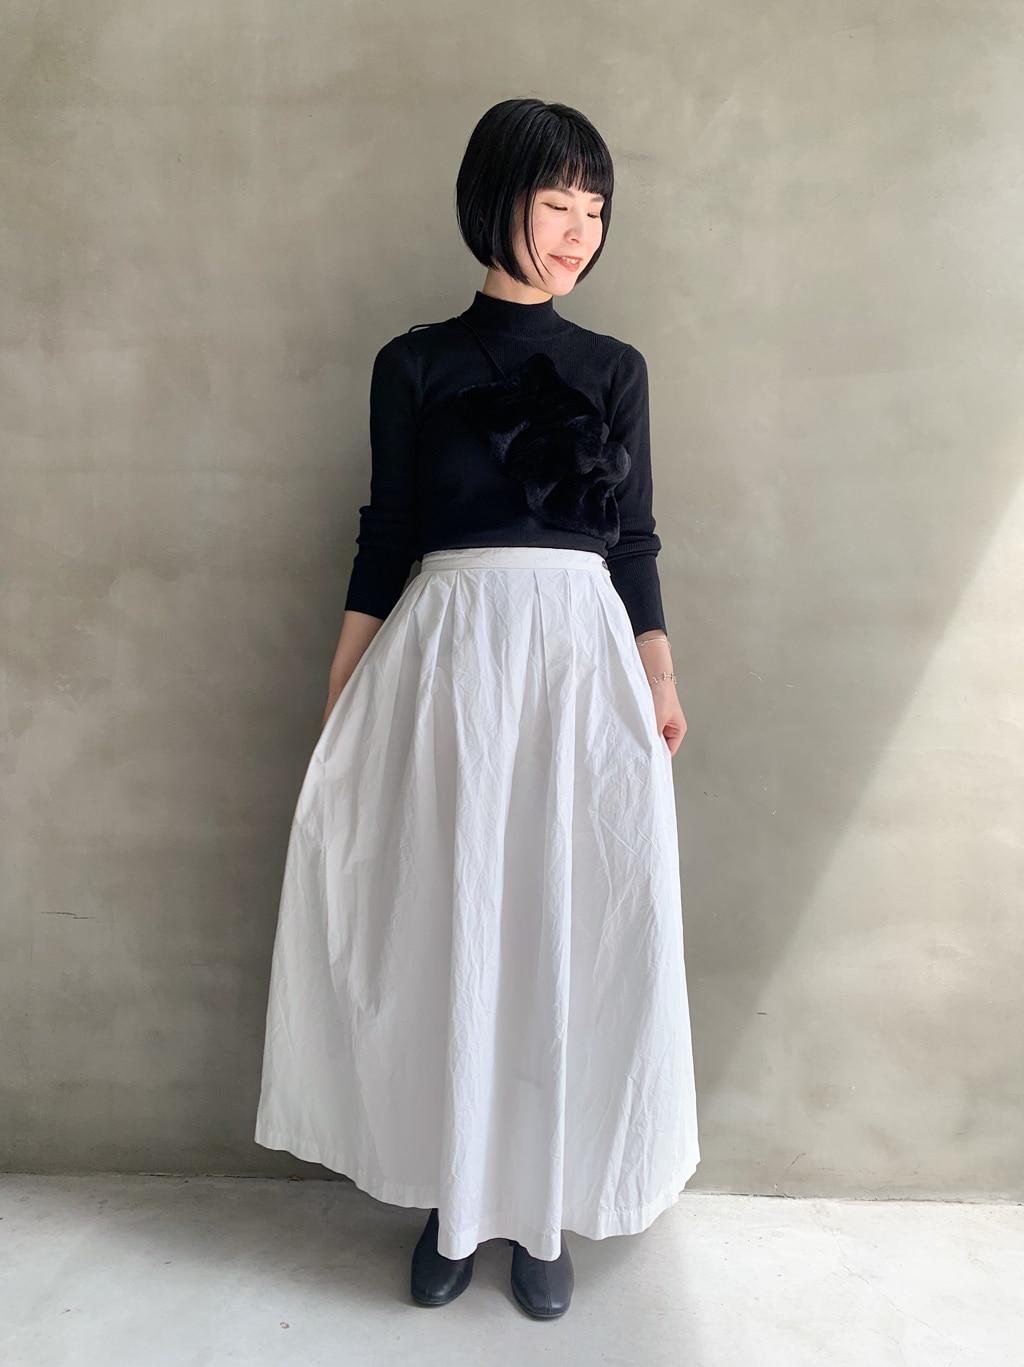 caph troupe 福岡薬院路面 身長:155cm 2020.09.29